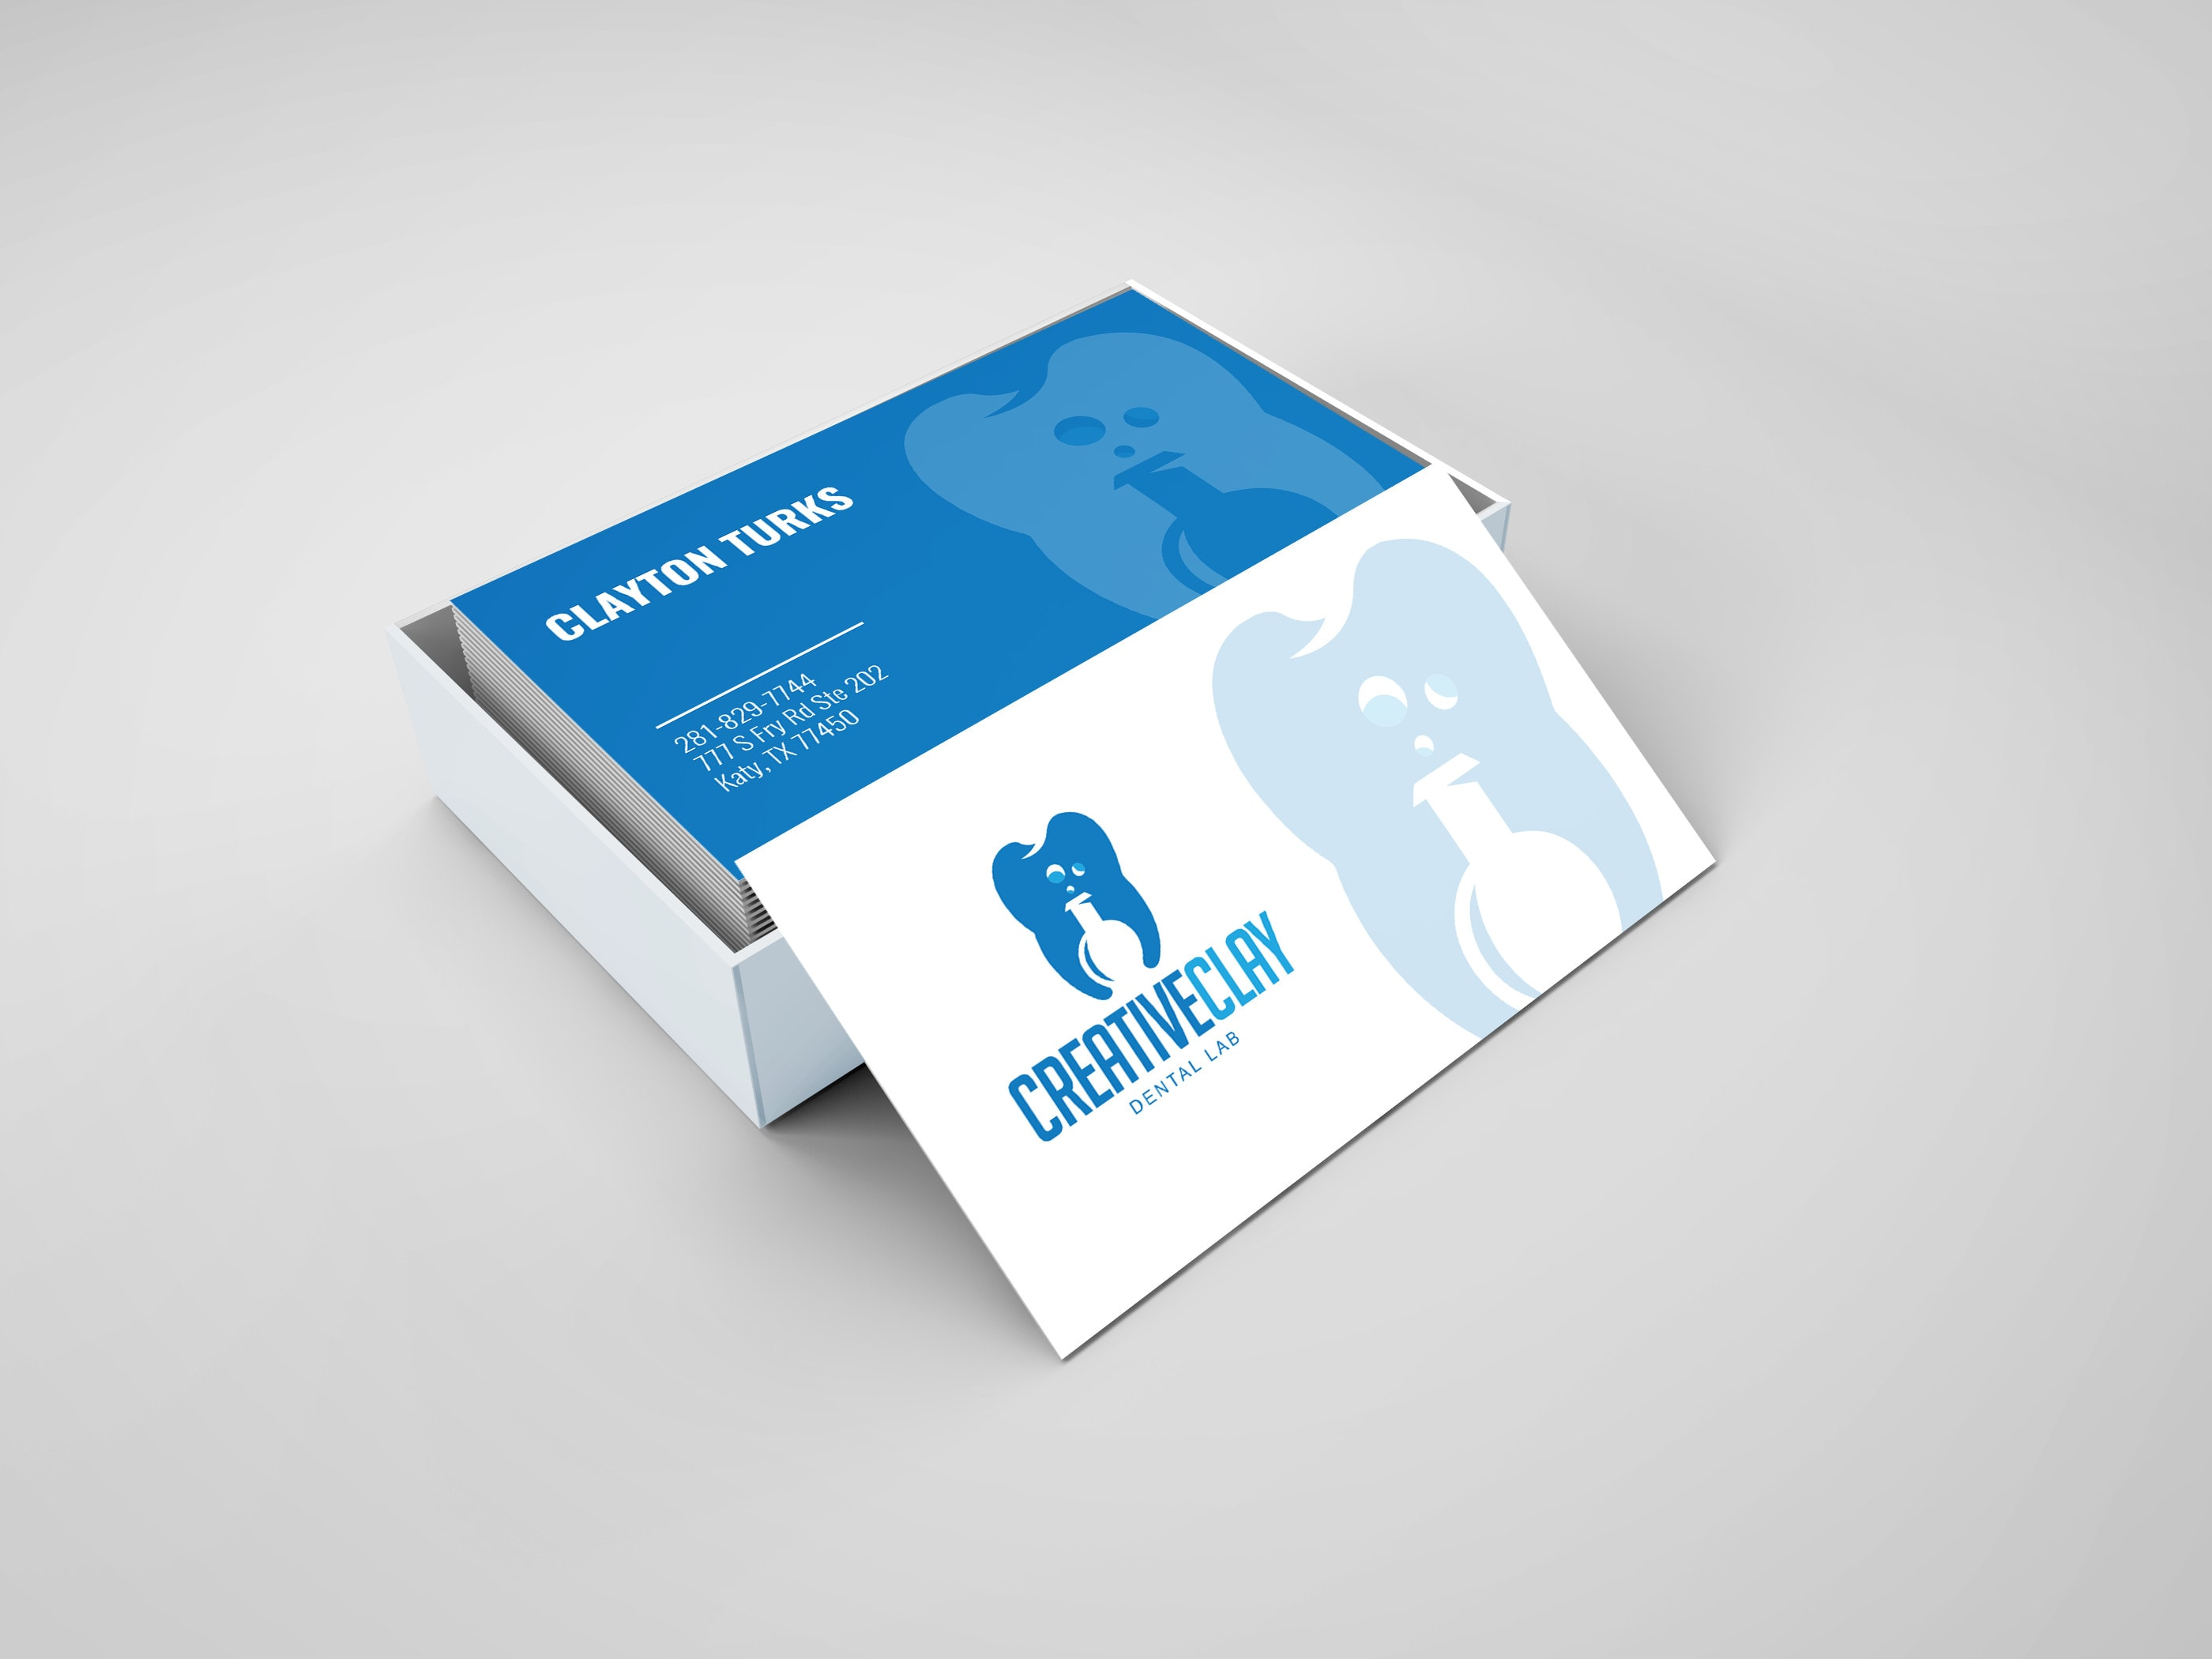 Design Minimal Business Card By Joeboi